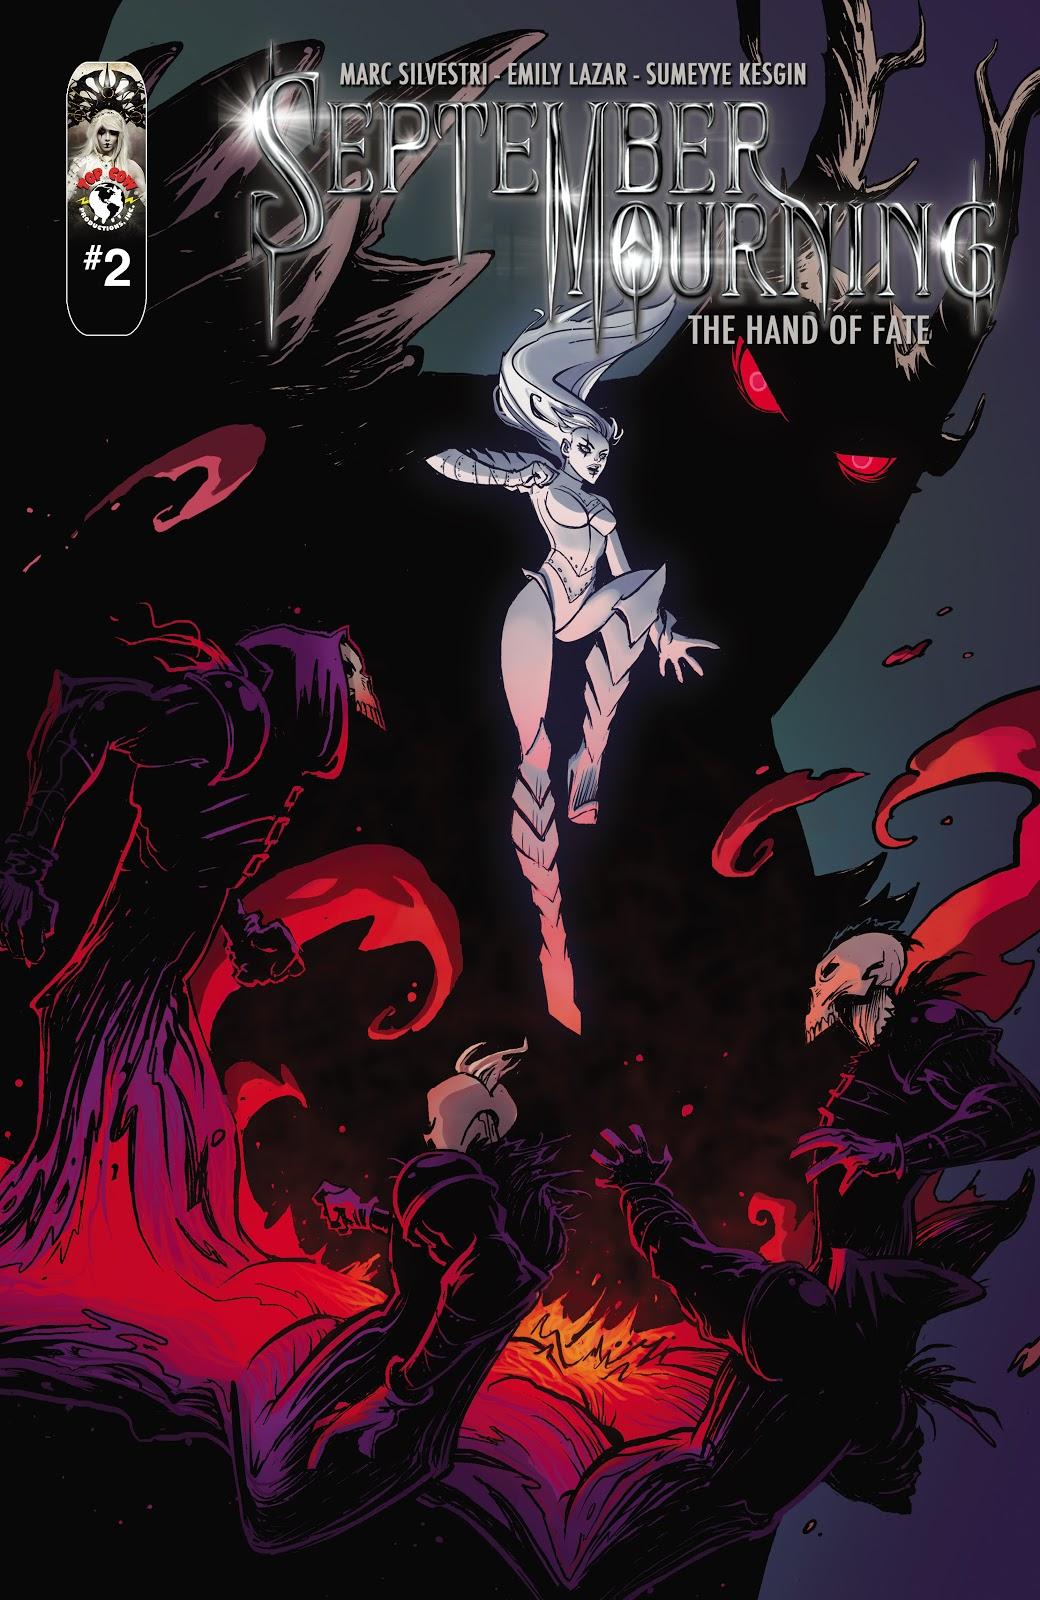 Read online September Mourning Volume 1 comic -  Issue #2 - 1